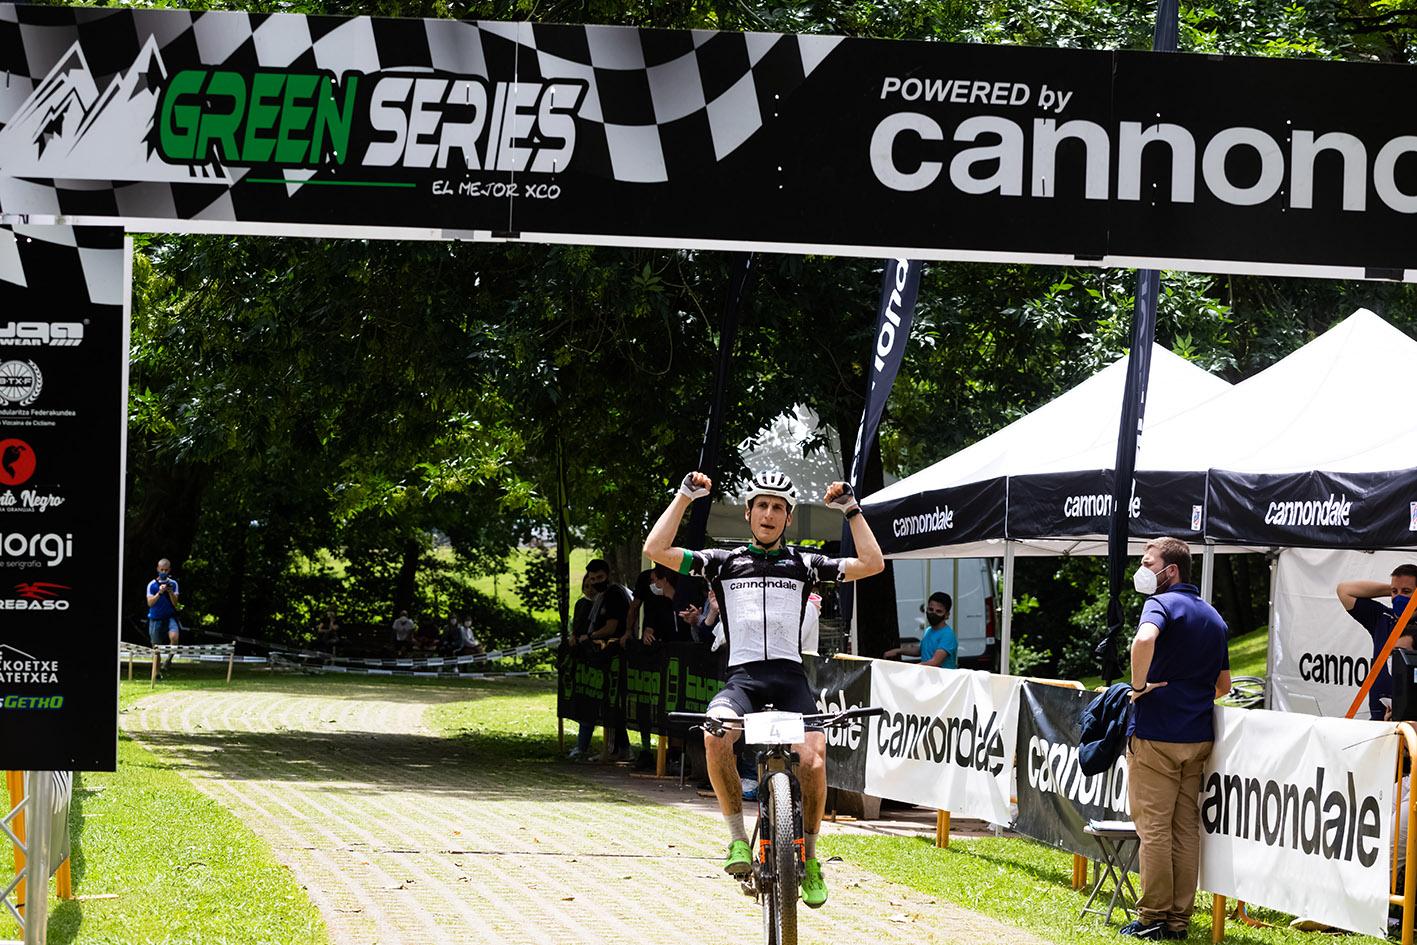 Green Series Challenge XCO powered by Cannondale 7 Barakaldo Inigo Gomezjpg